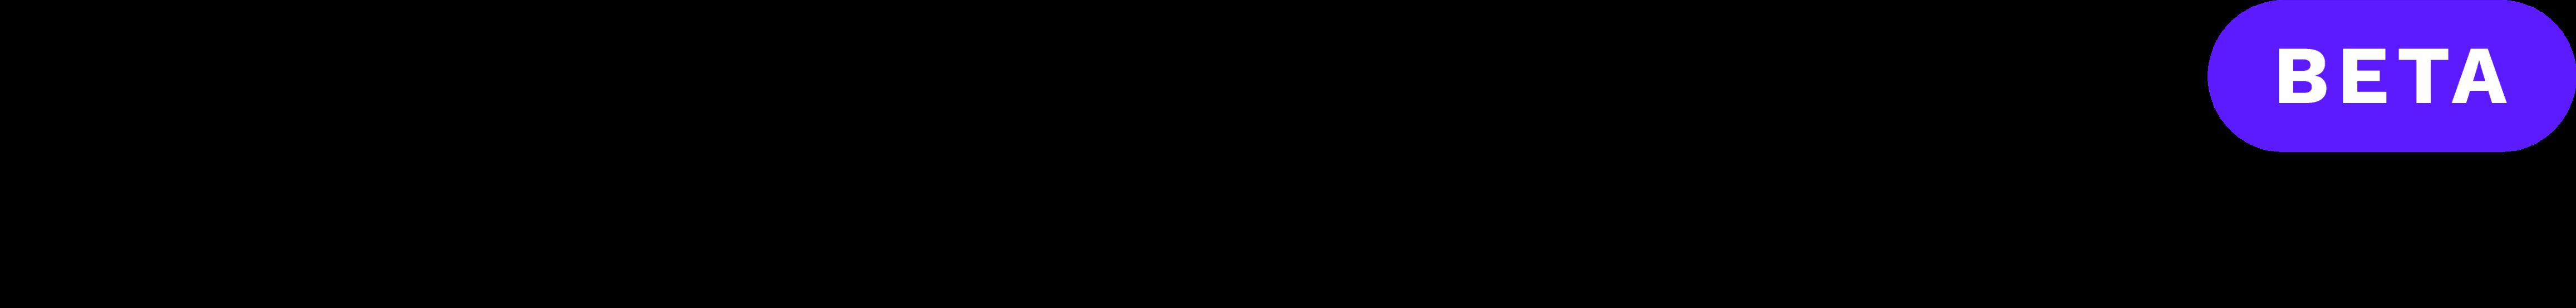 Beta 01